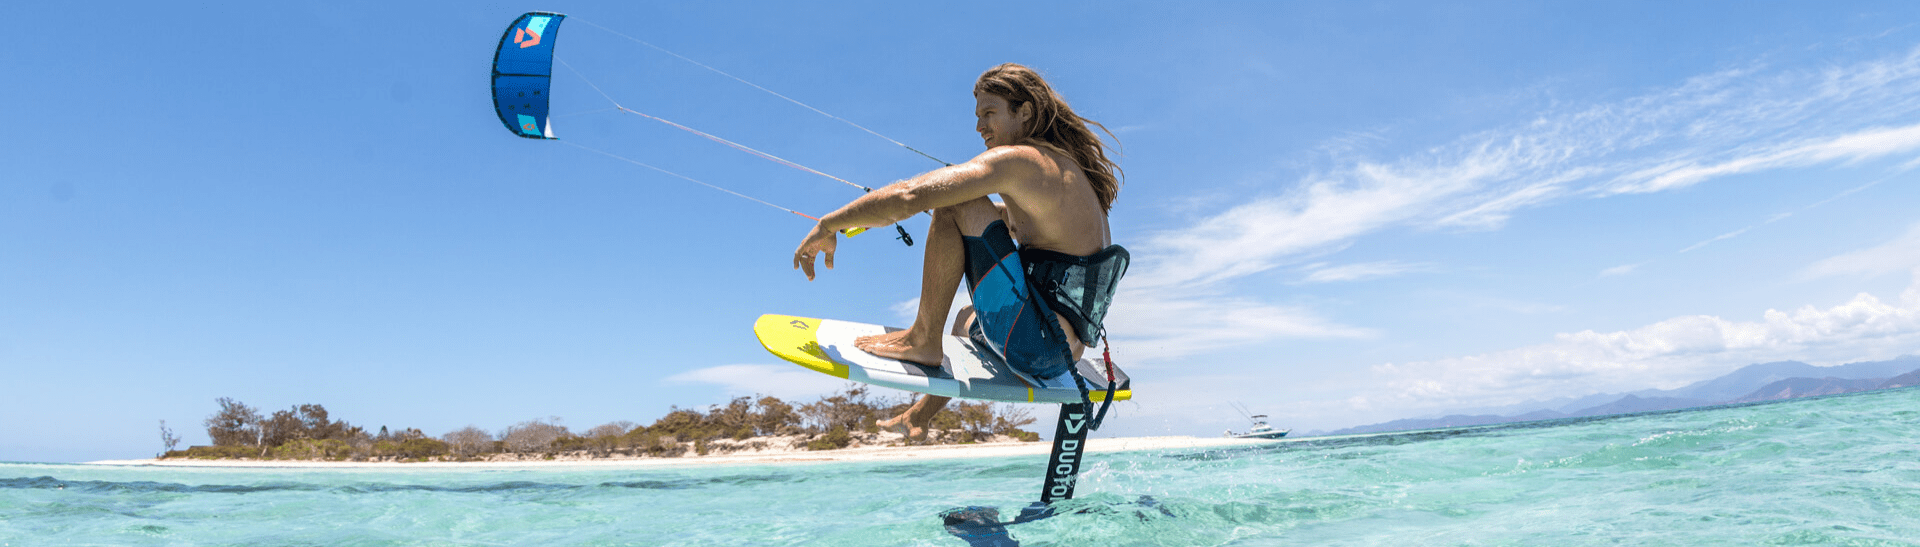 kitesurf_hydrofoil